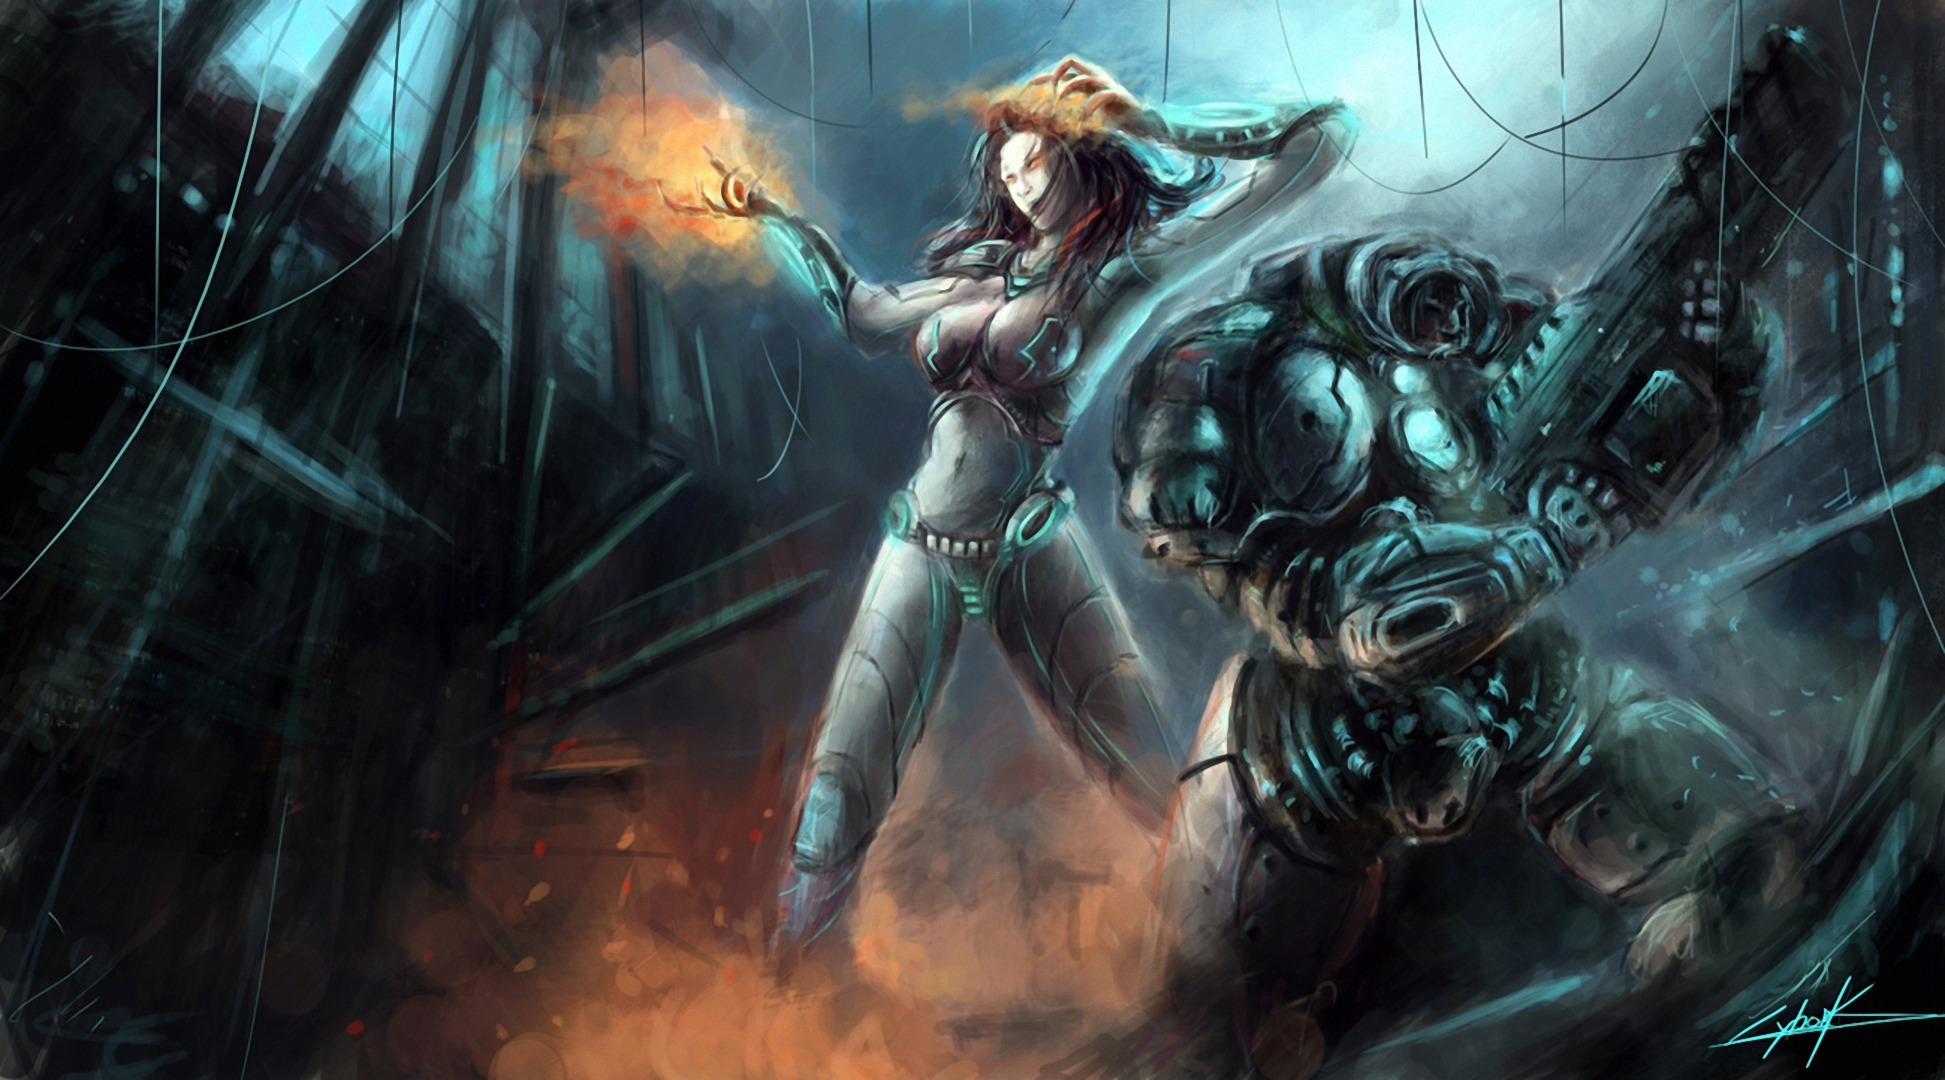 Starcraft wallpapers pictures images - Starcraft 2 wallpaper art ...